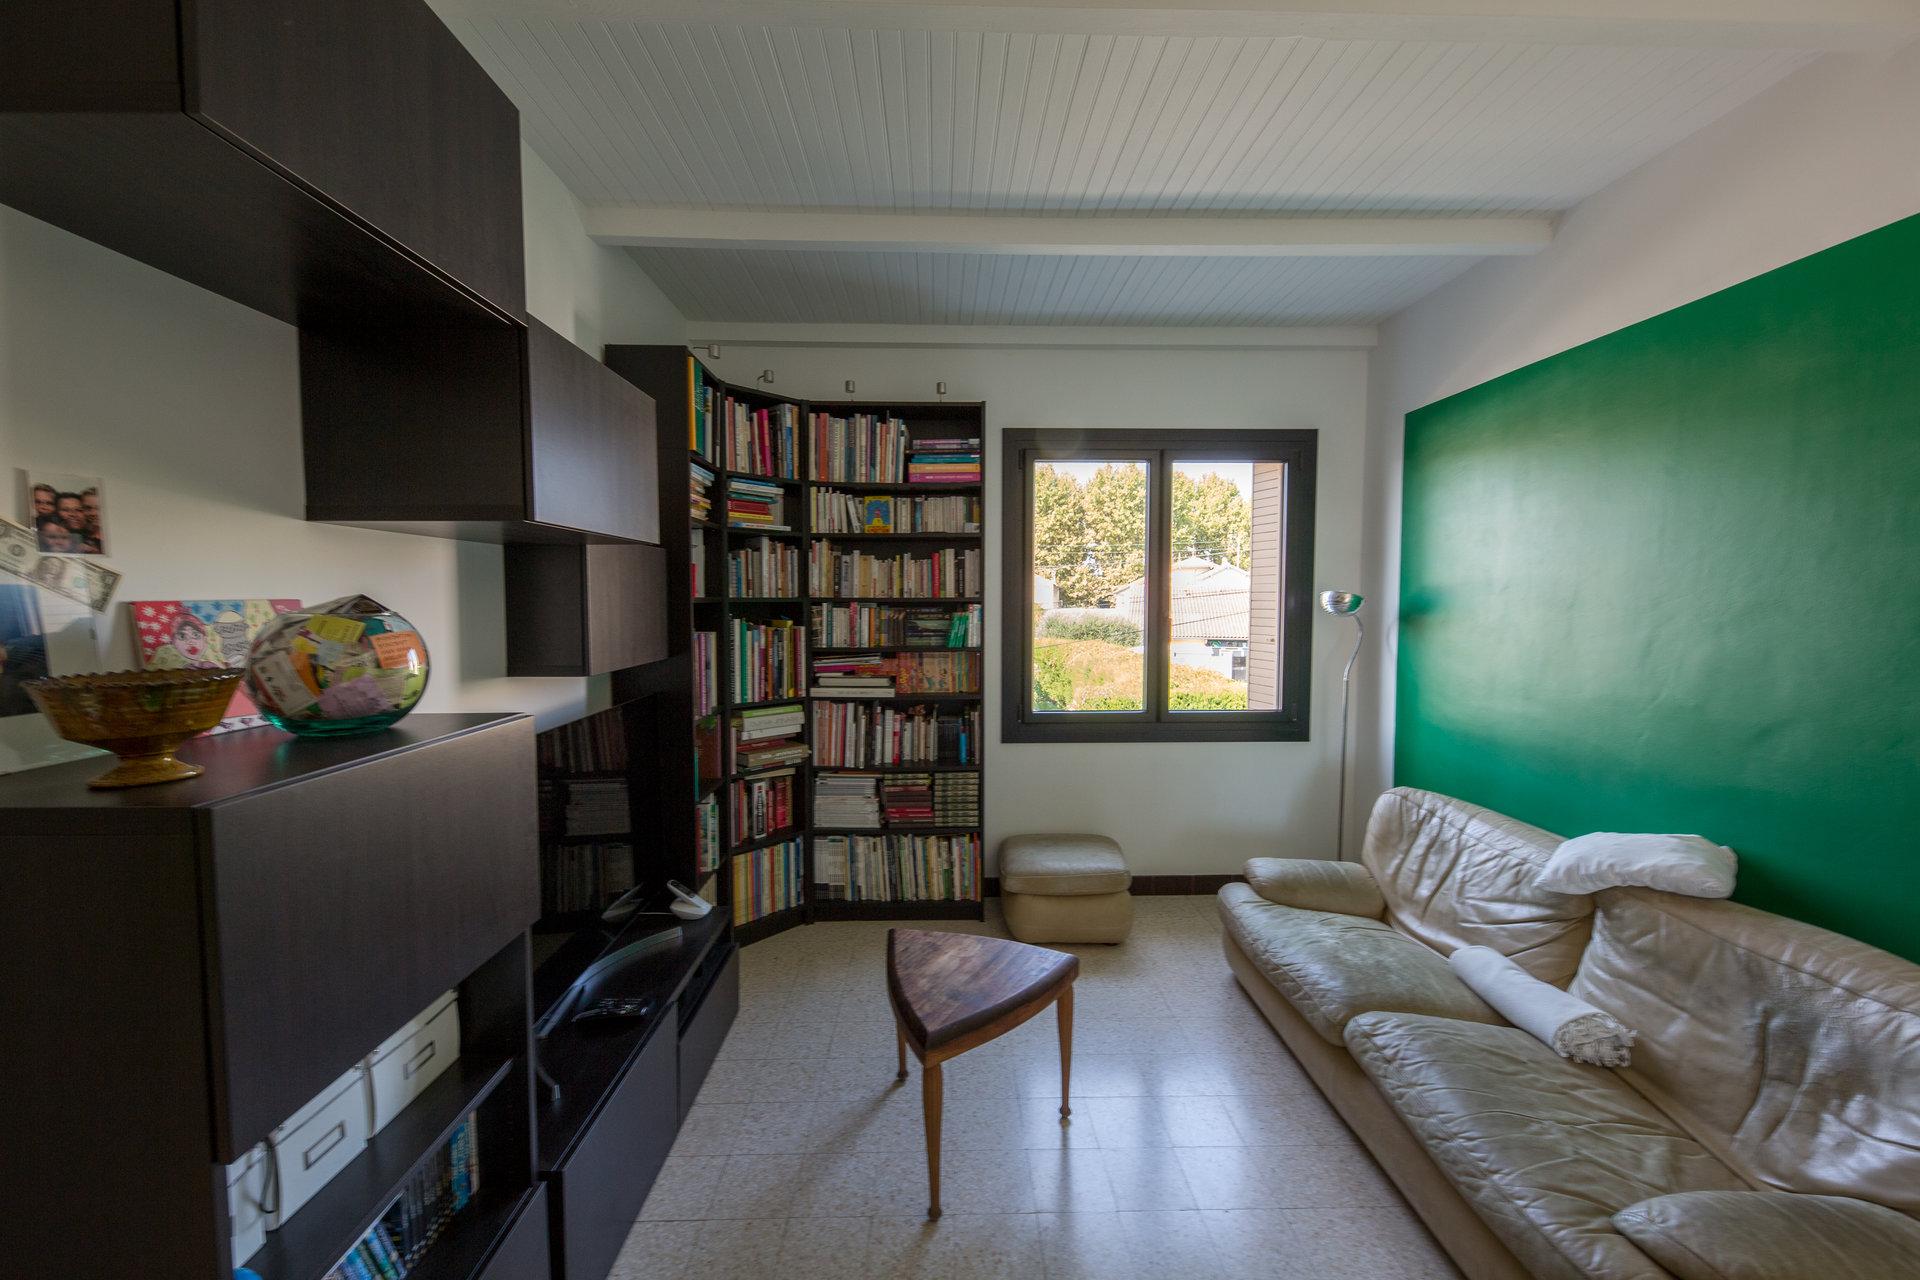 Monplaisir - Maison rénovée 4ch